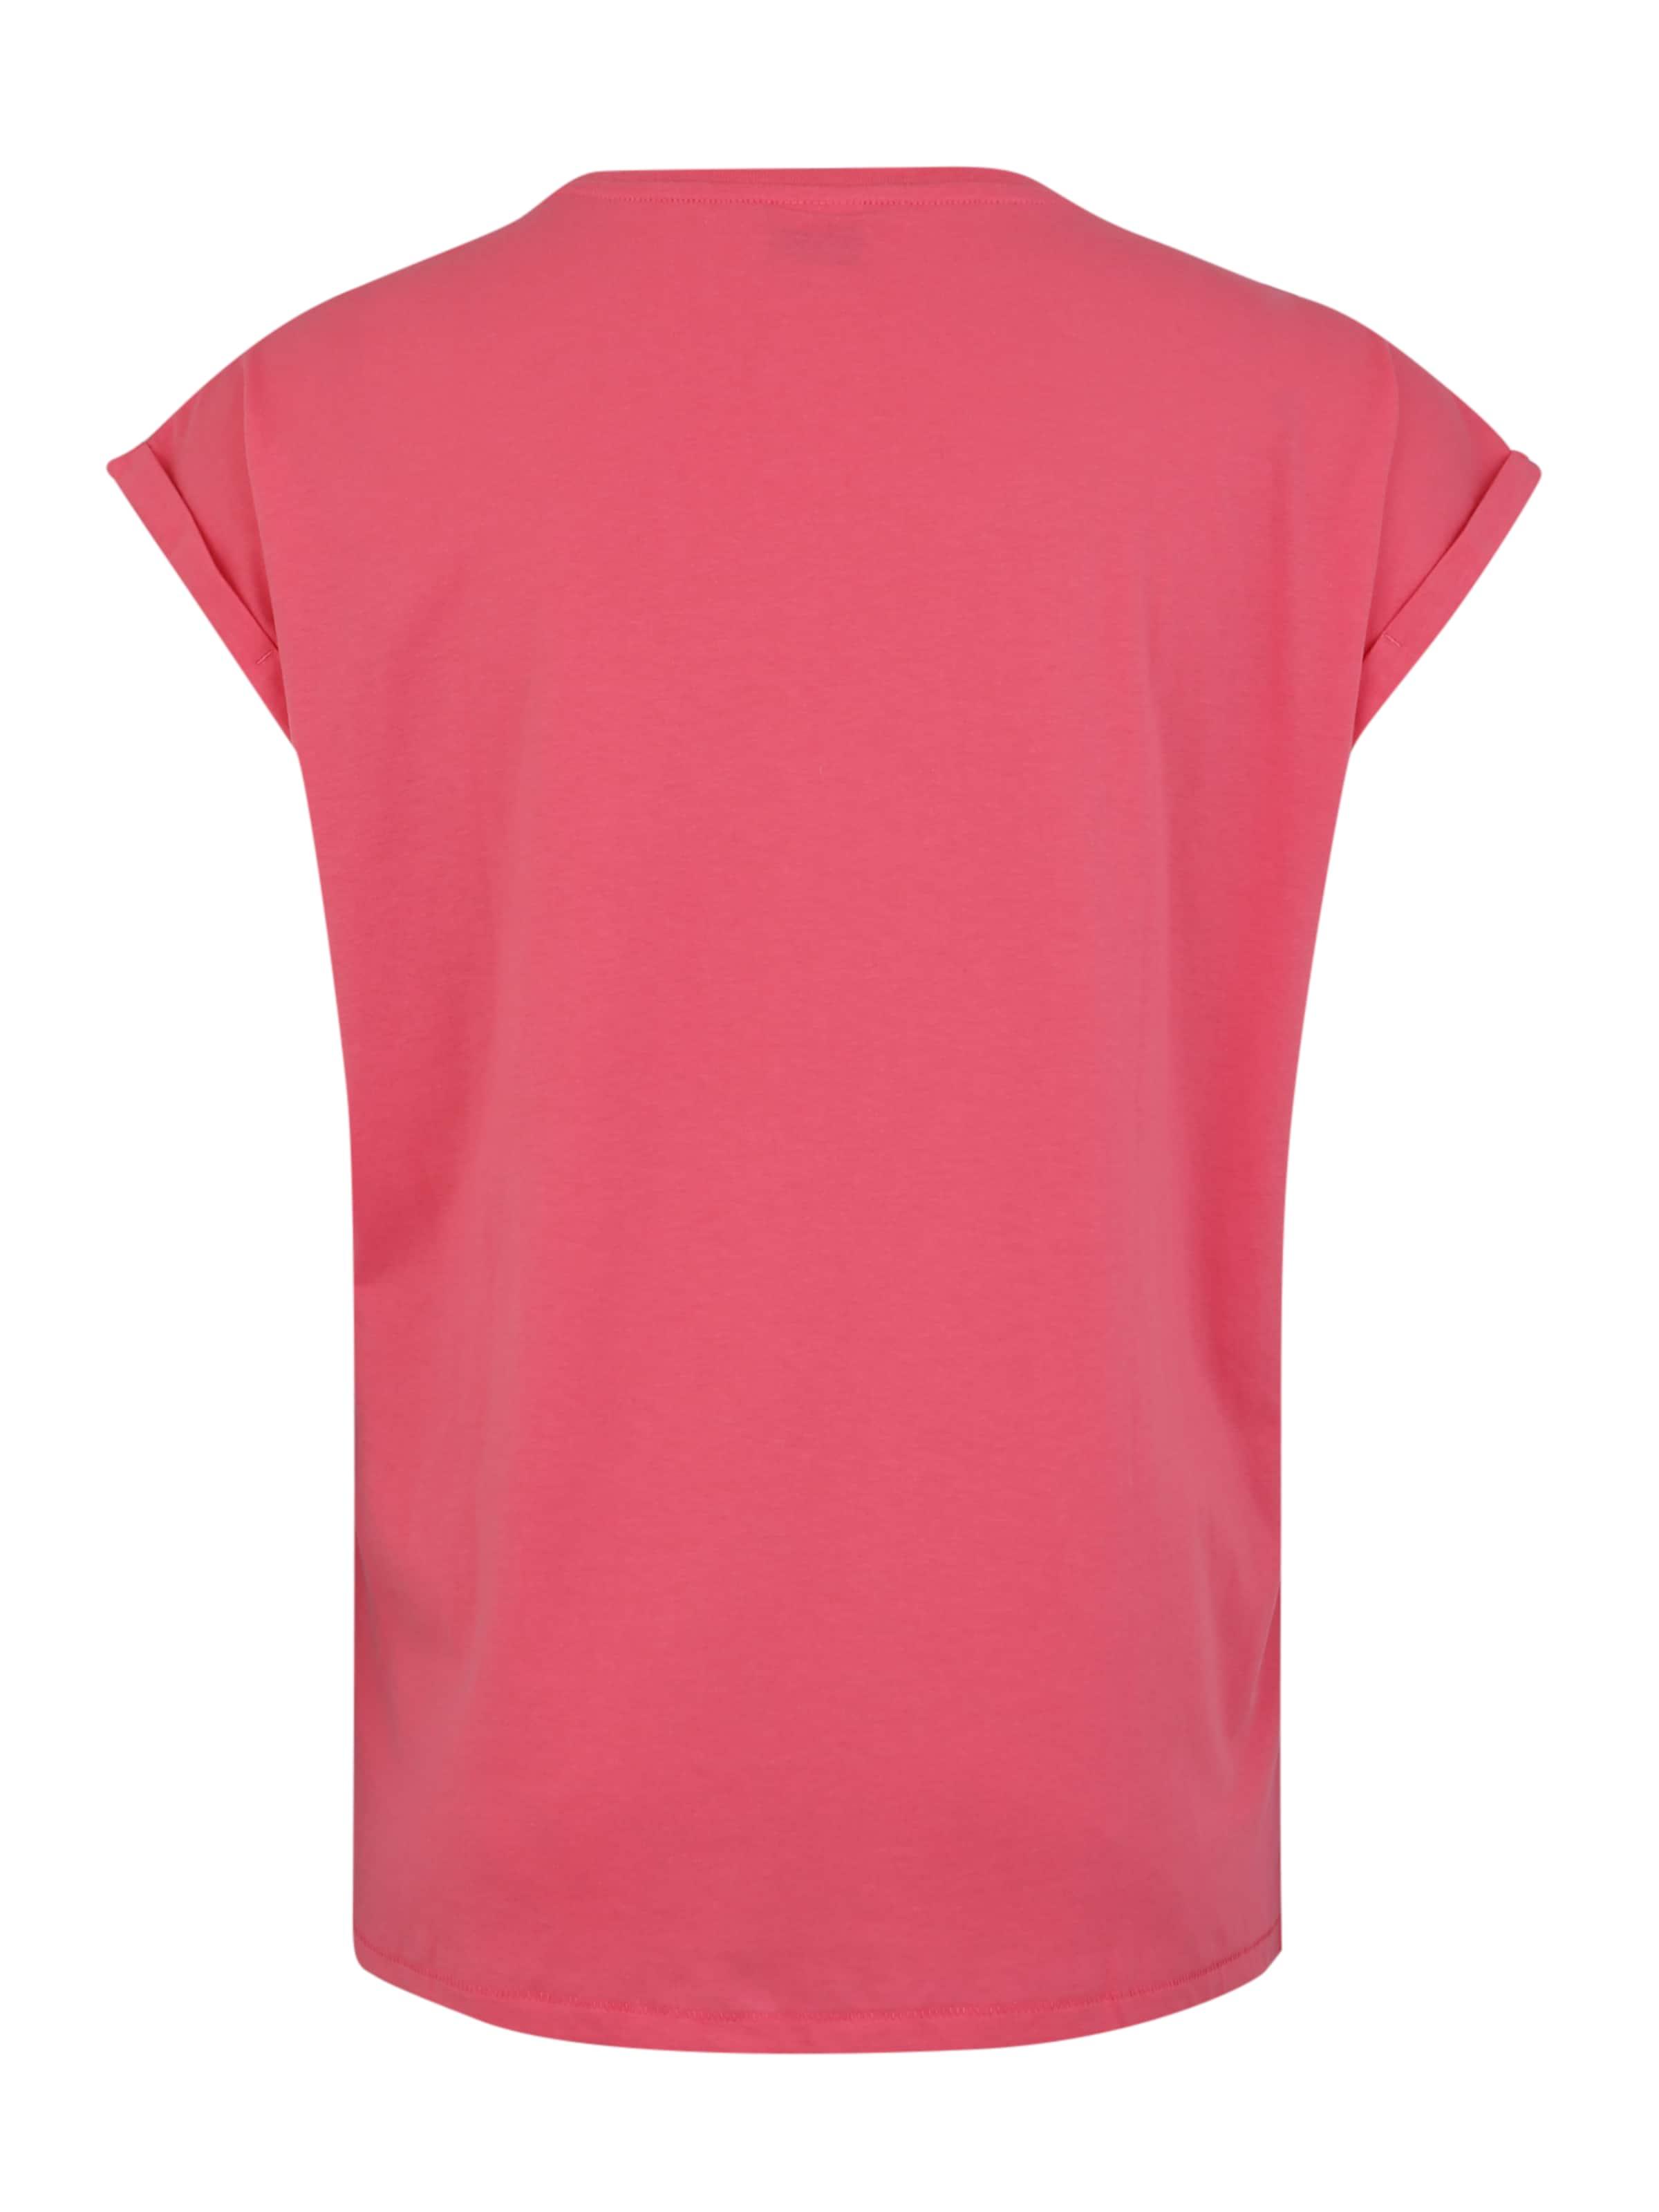 Classics Curvy Pink Shirt Urban In HED92I